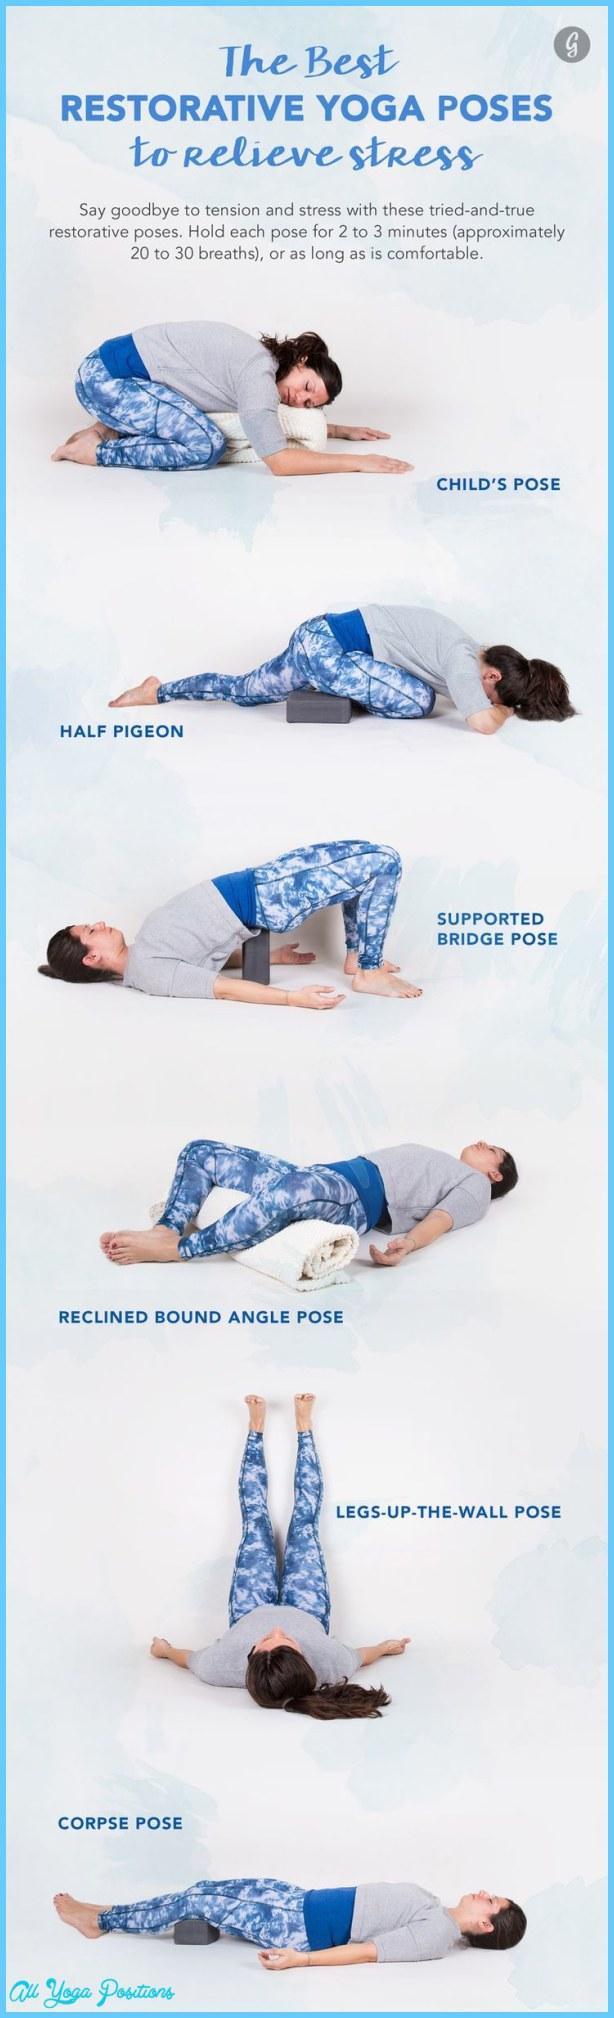 Yen Yoga Poses_12.jpg